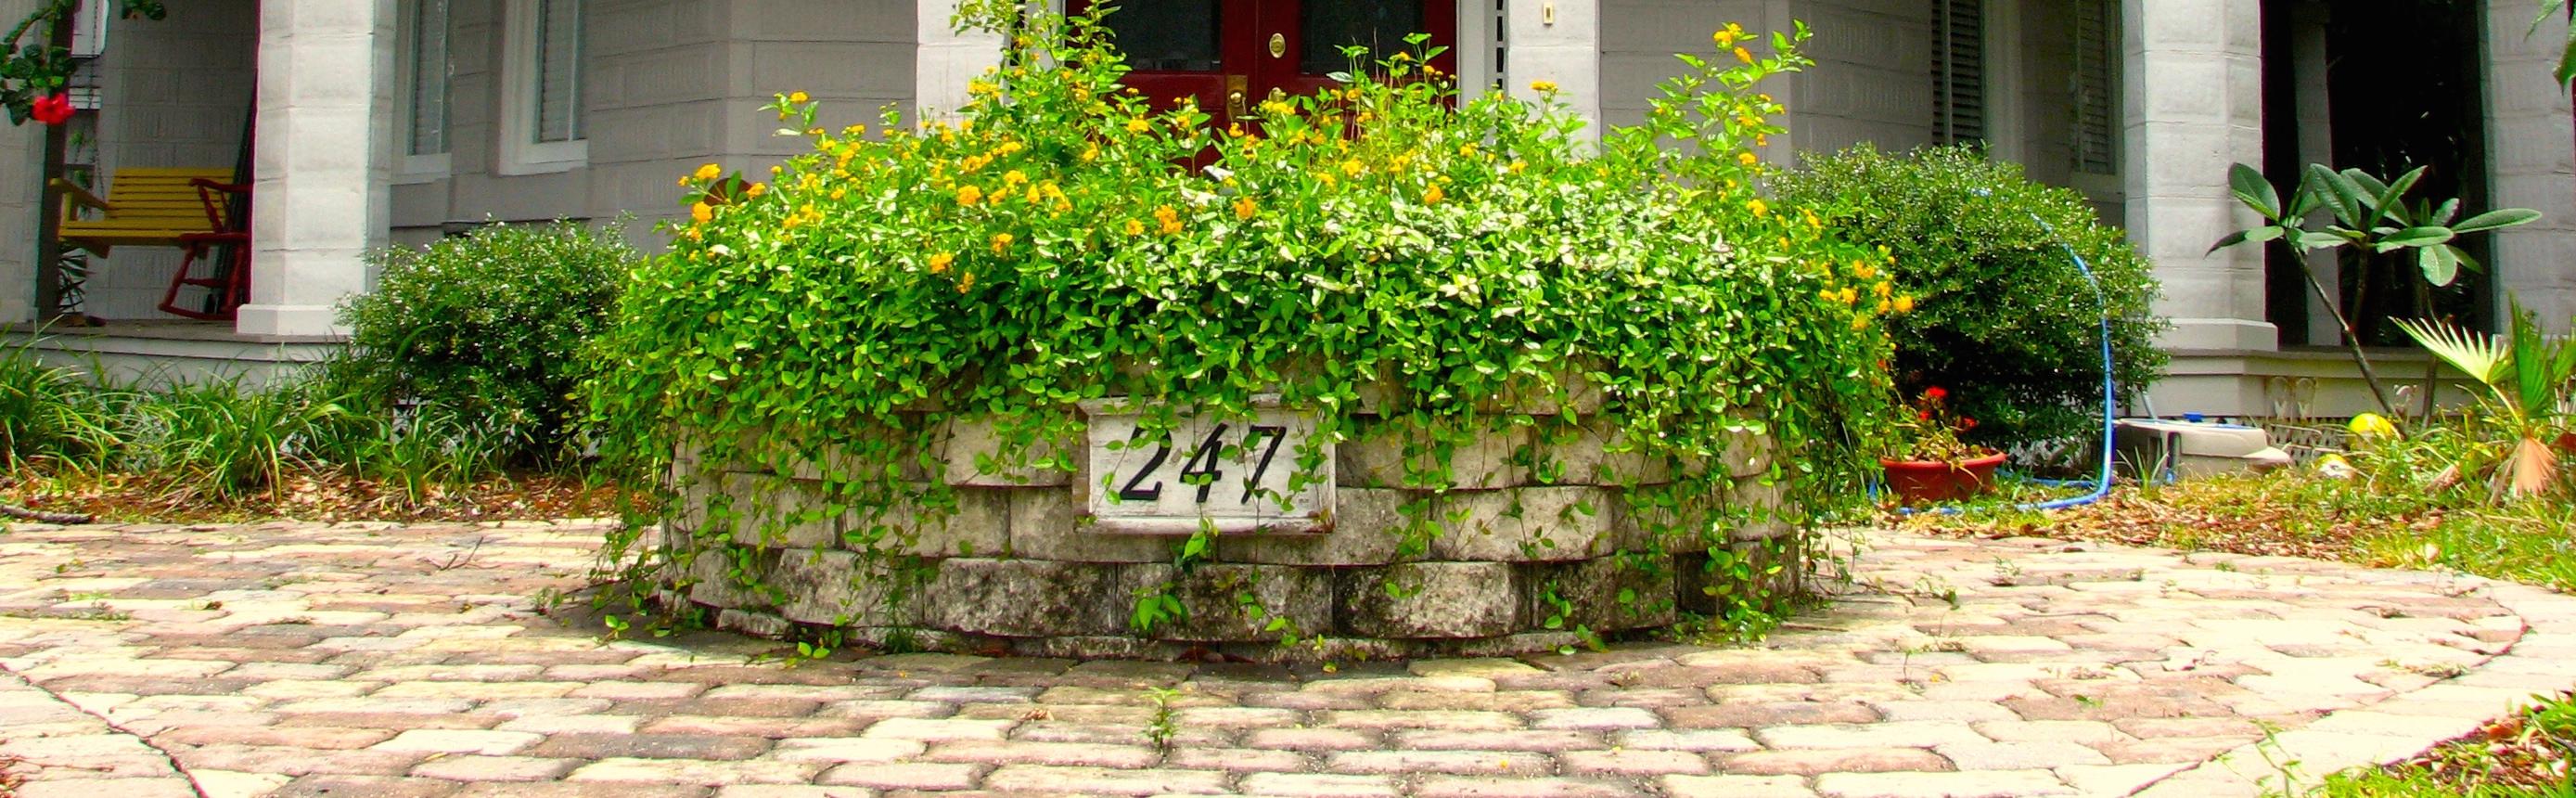 House number address